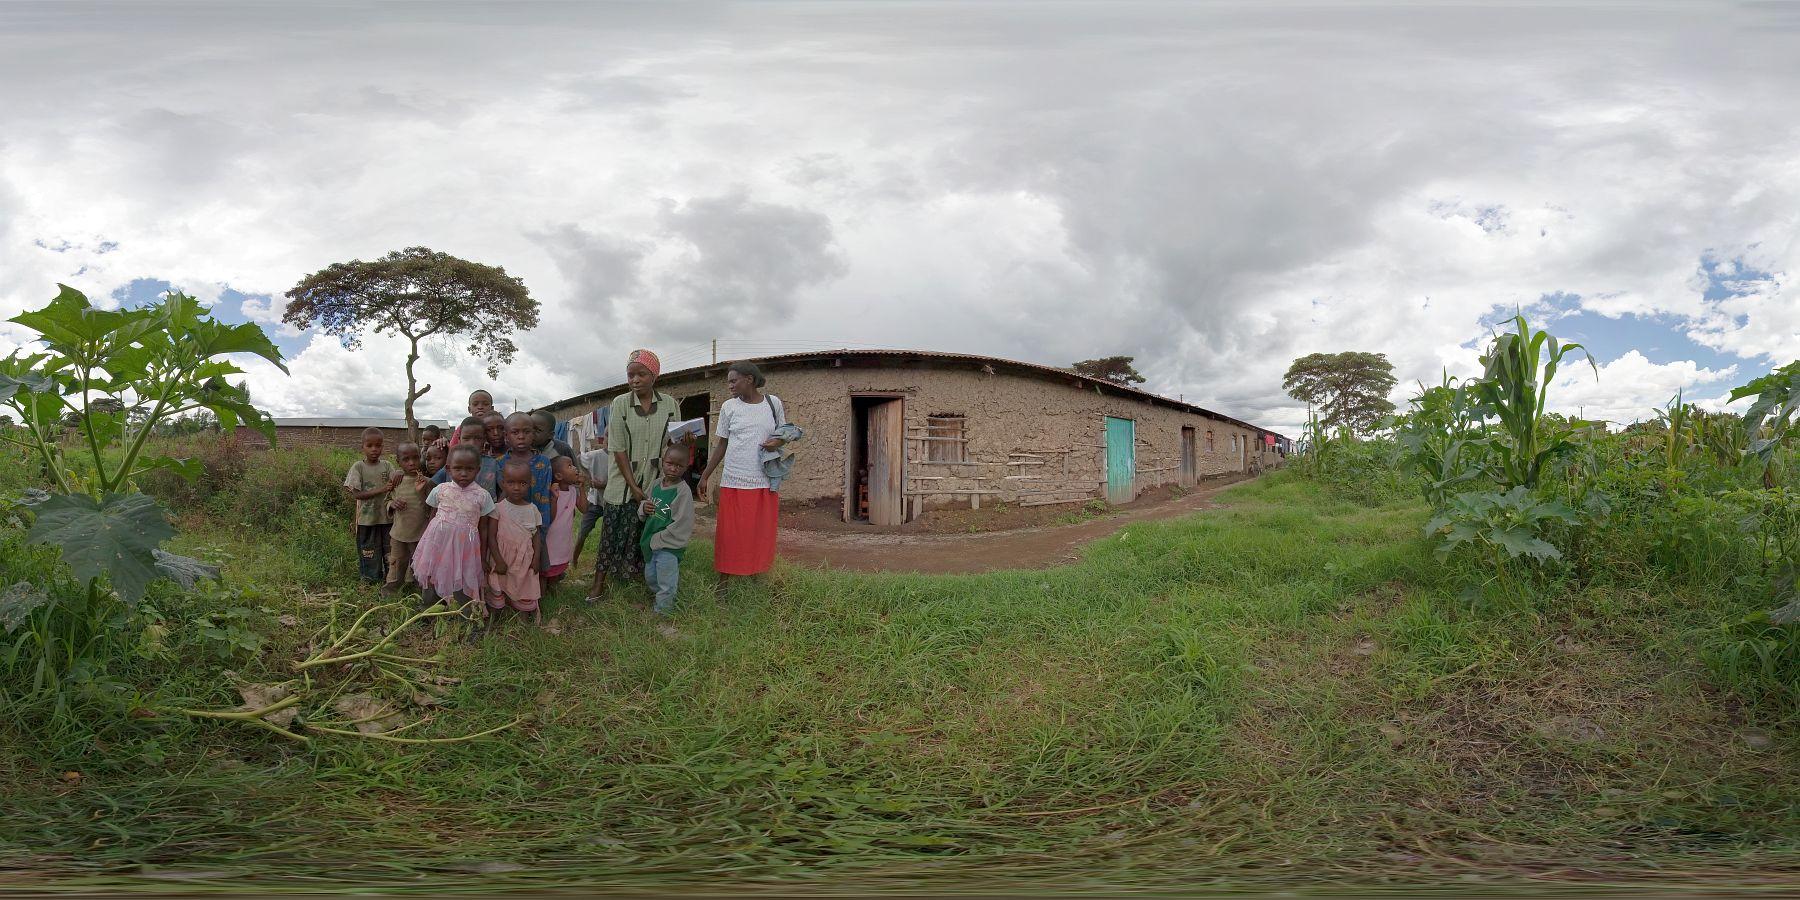 Panorama Kenia Nakuru Aidsfrauen 1